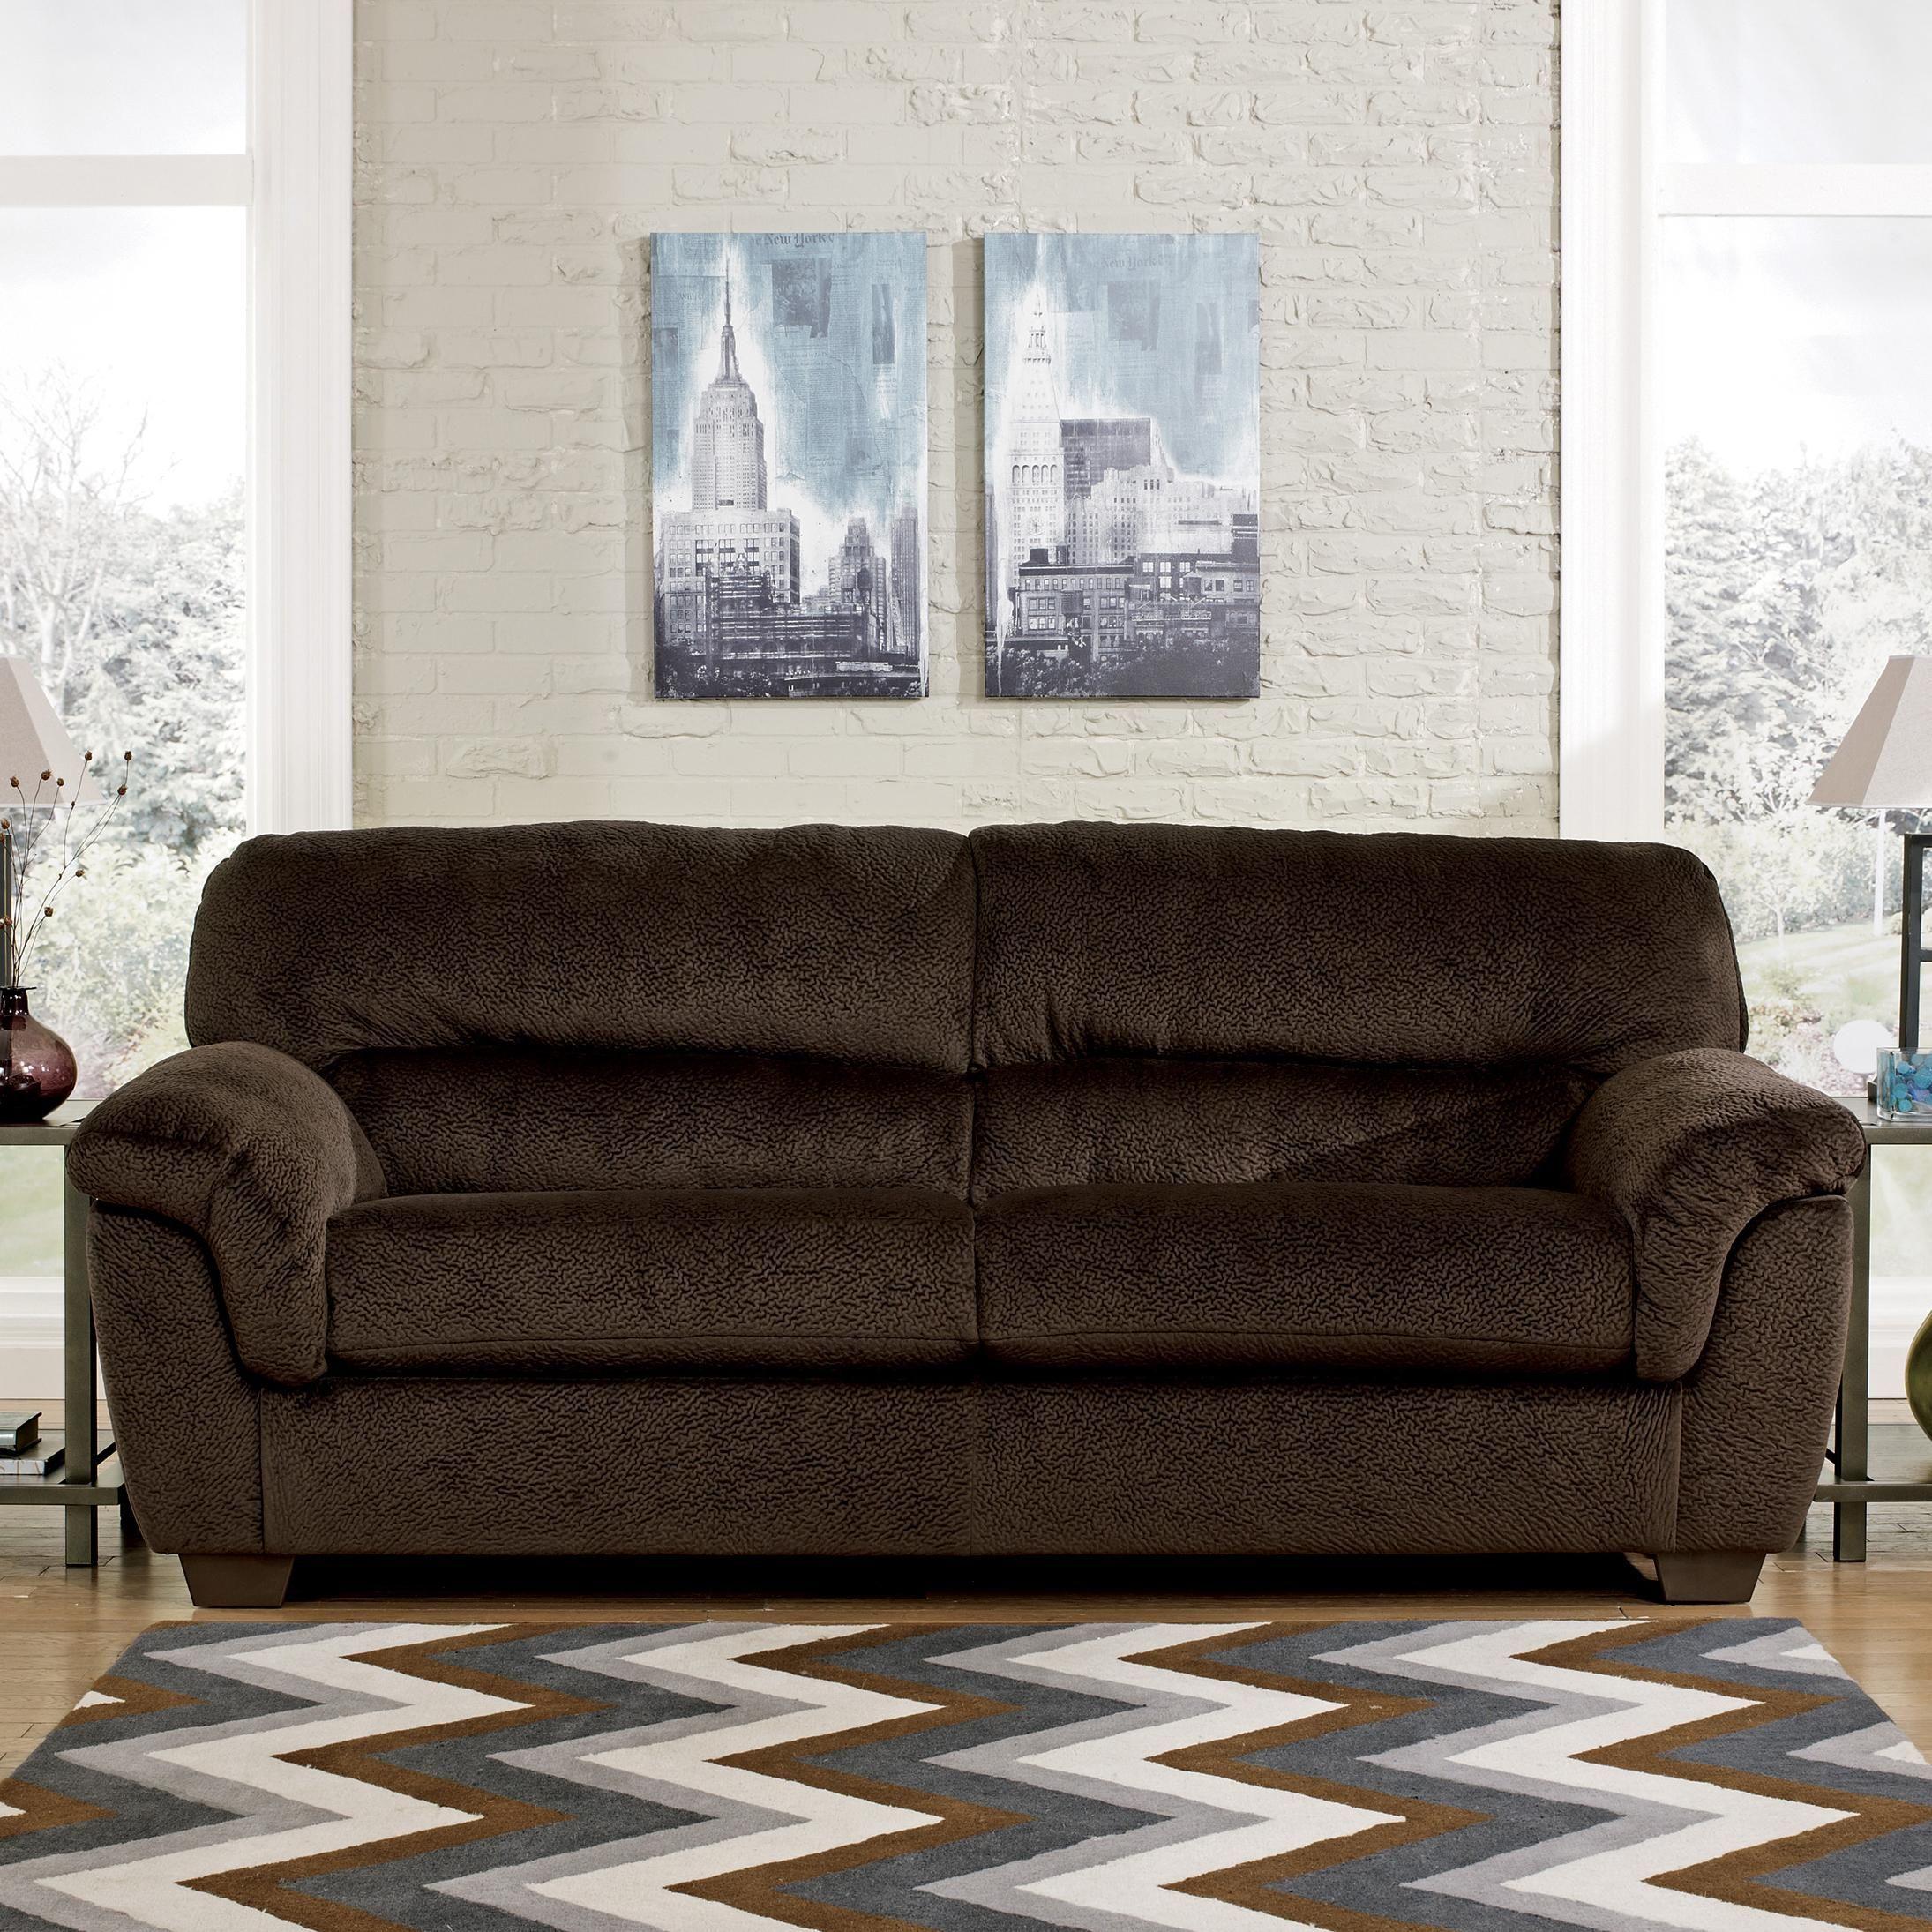 Good Coral Pike   Chocolate Sofa By Ashley $399 At SamsFurniture.com. Champion  Fabric Is